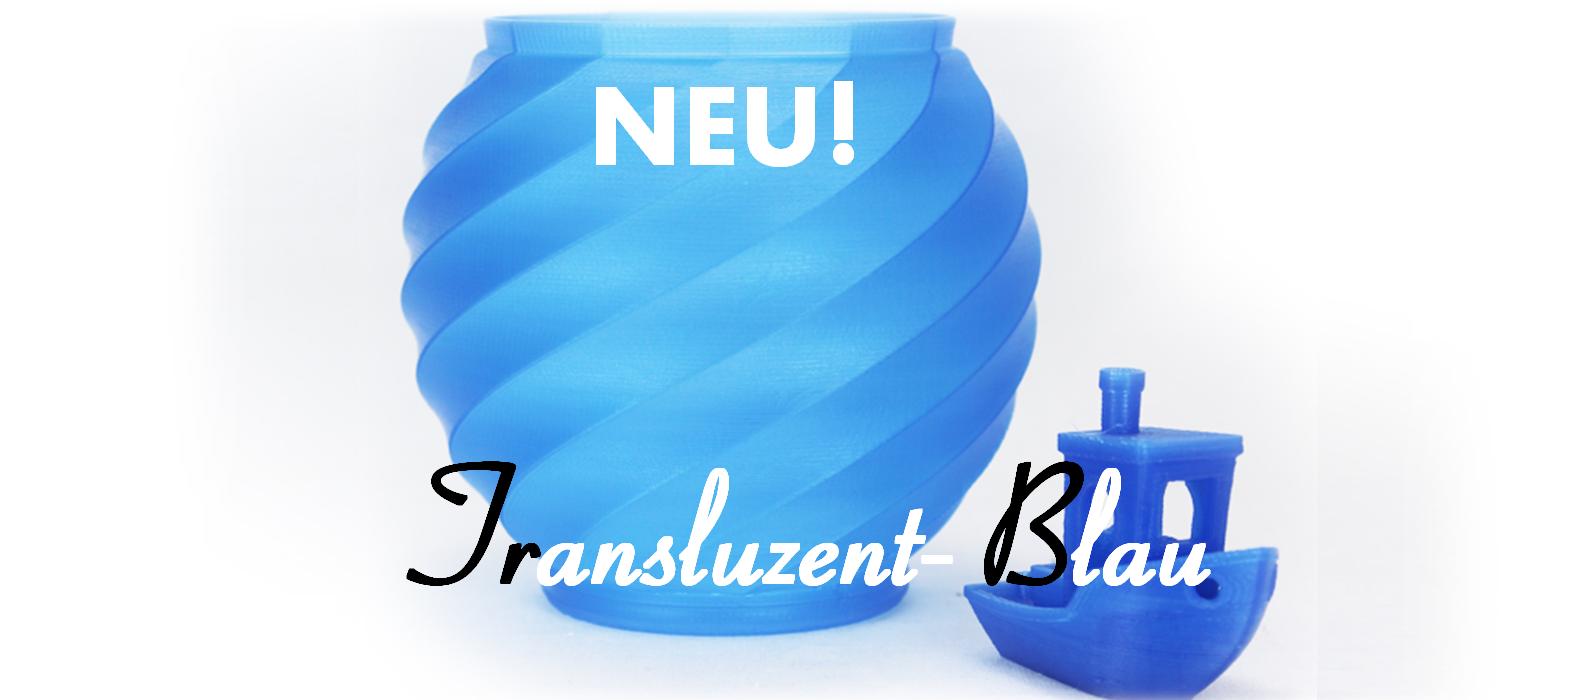 Neuer Farbton - Transluzent-Blau